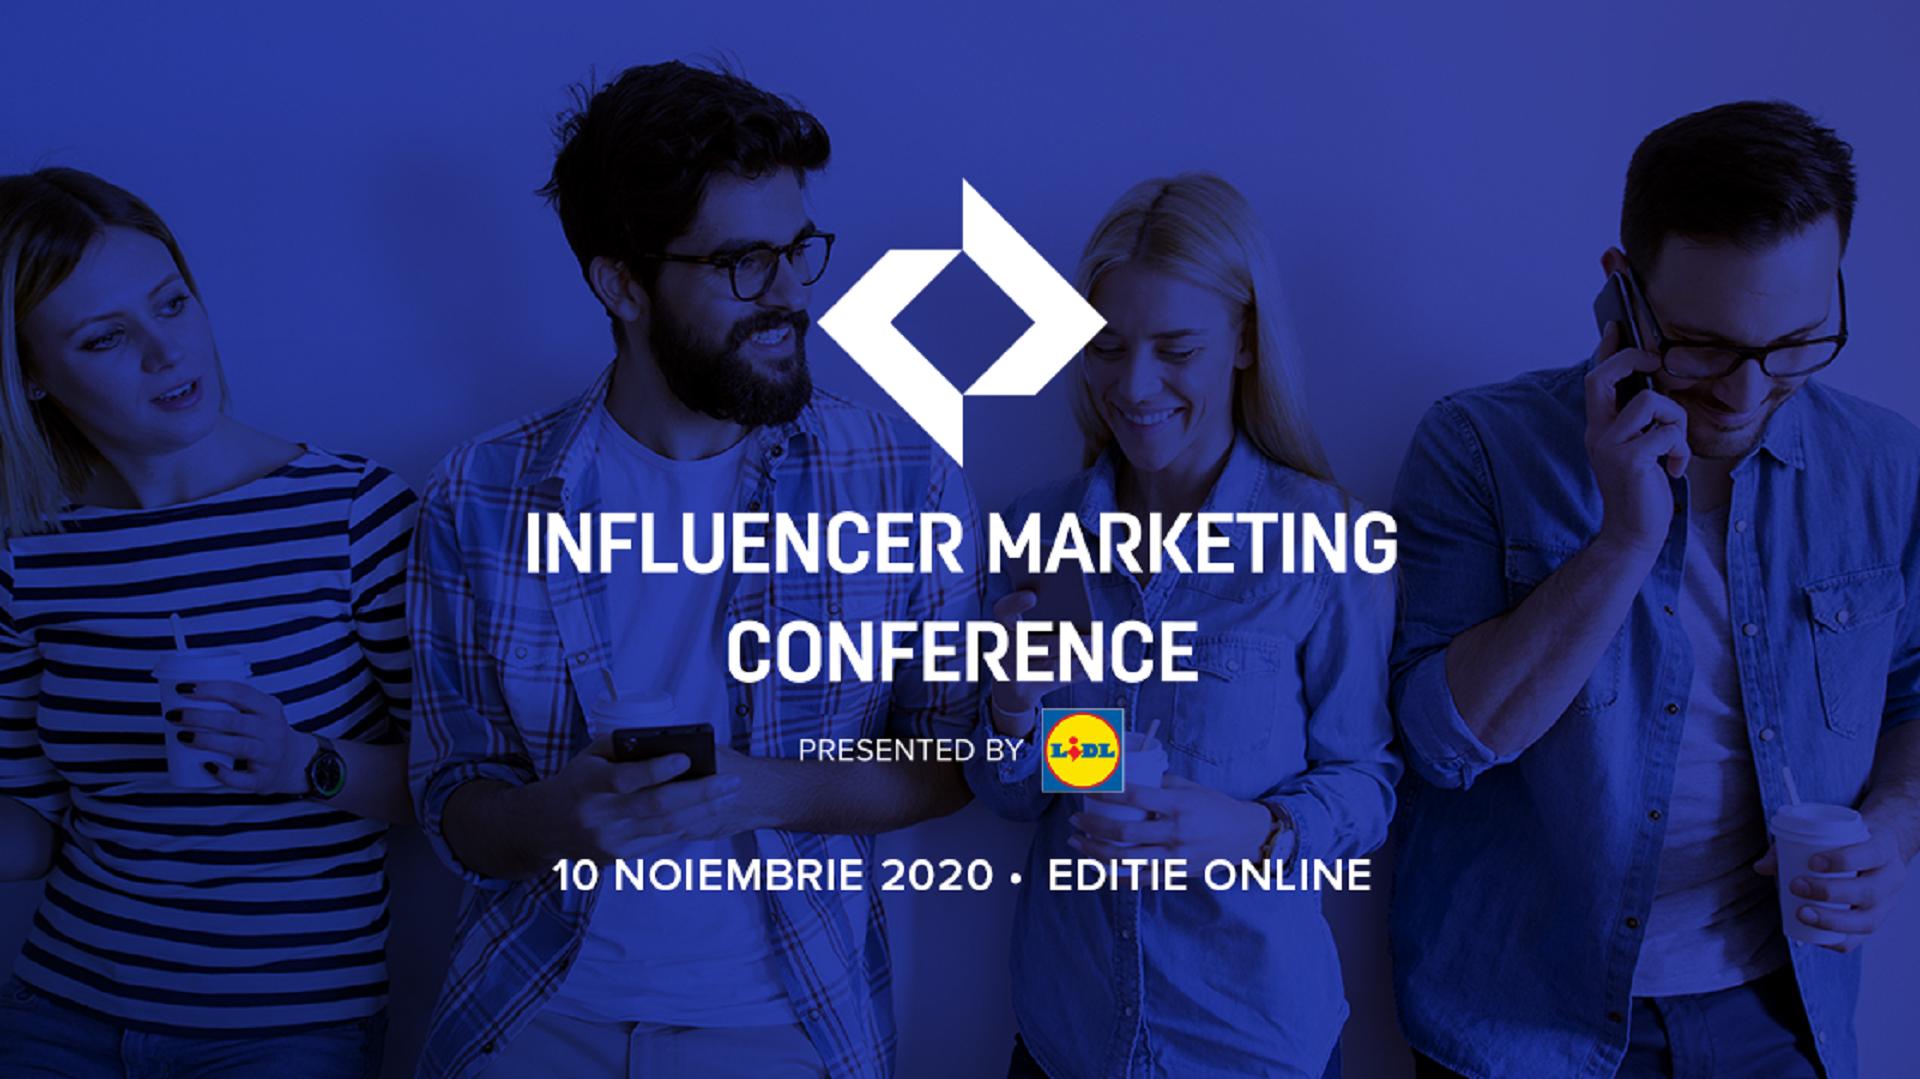 Influencer Marketing Conference 2020